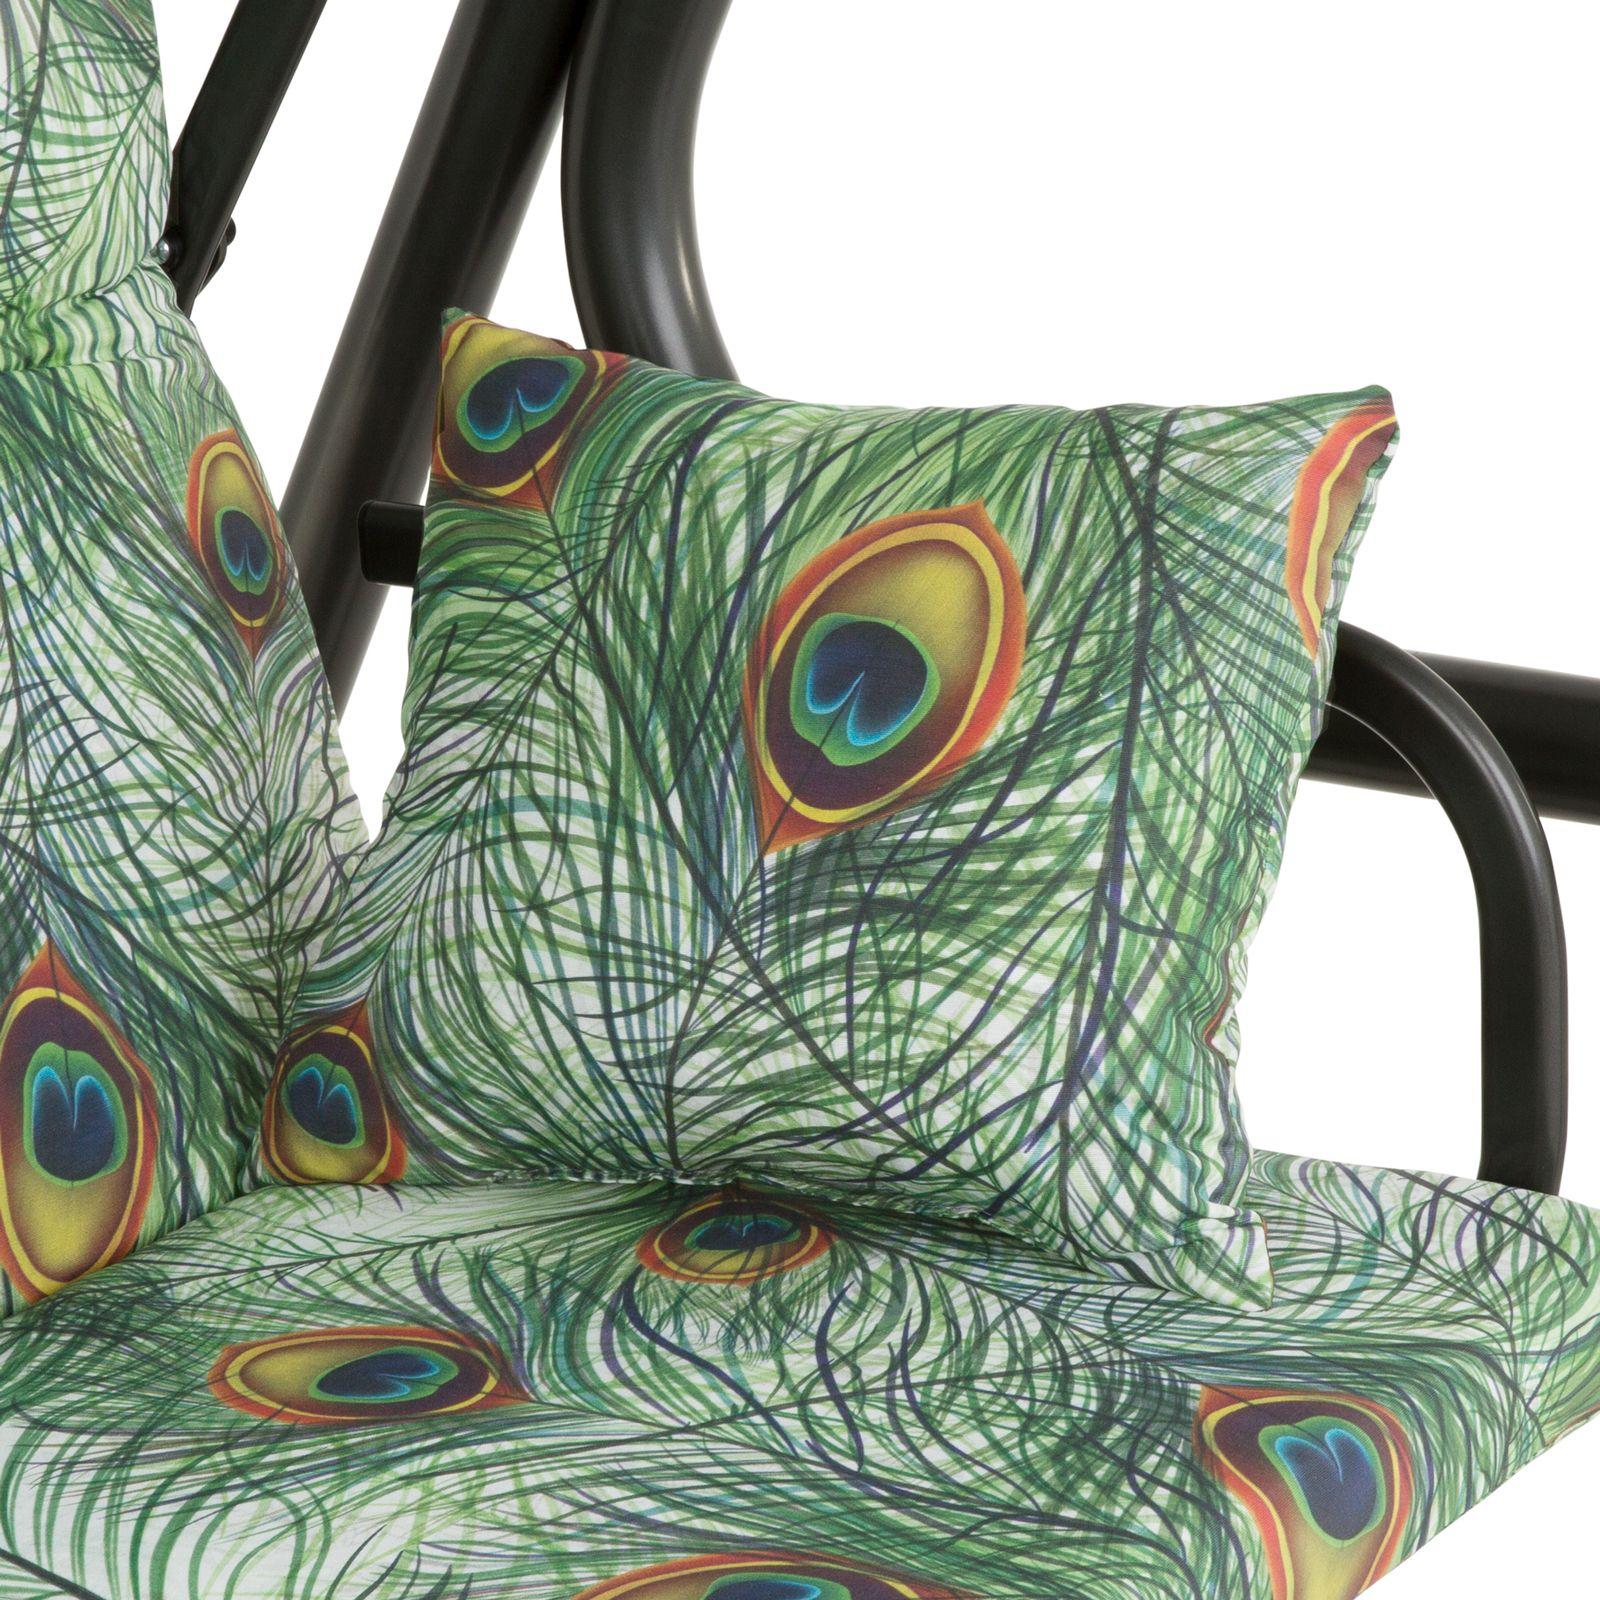 Profilowane poduszki na huśtawkę 180 cm Rimini / Venezia (Bresso) G036-02LB PATIO